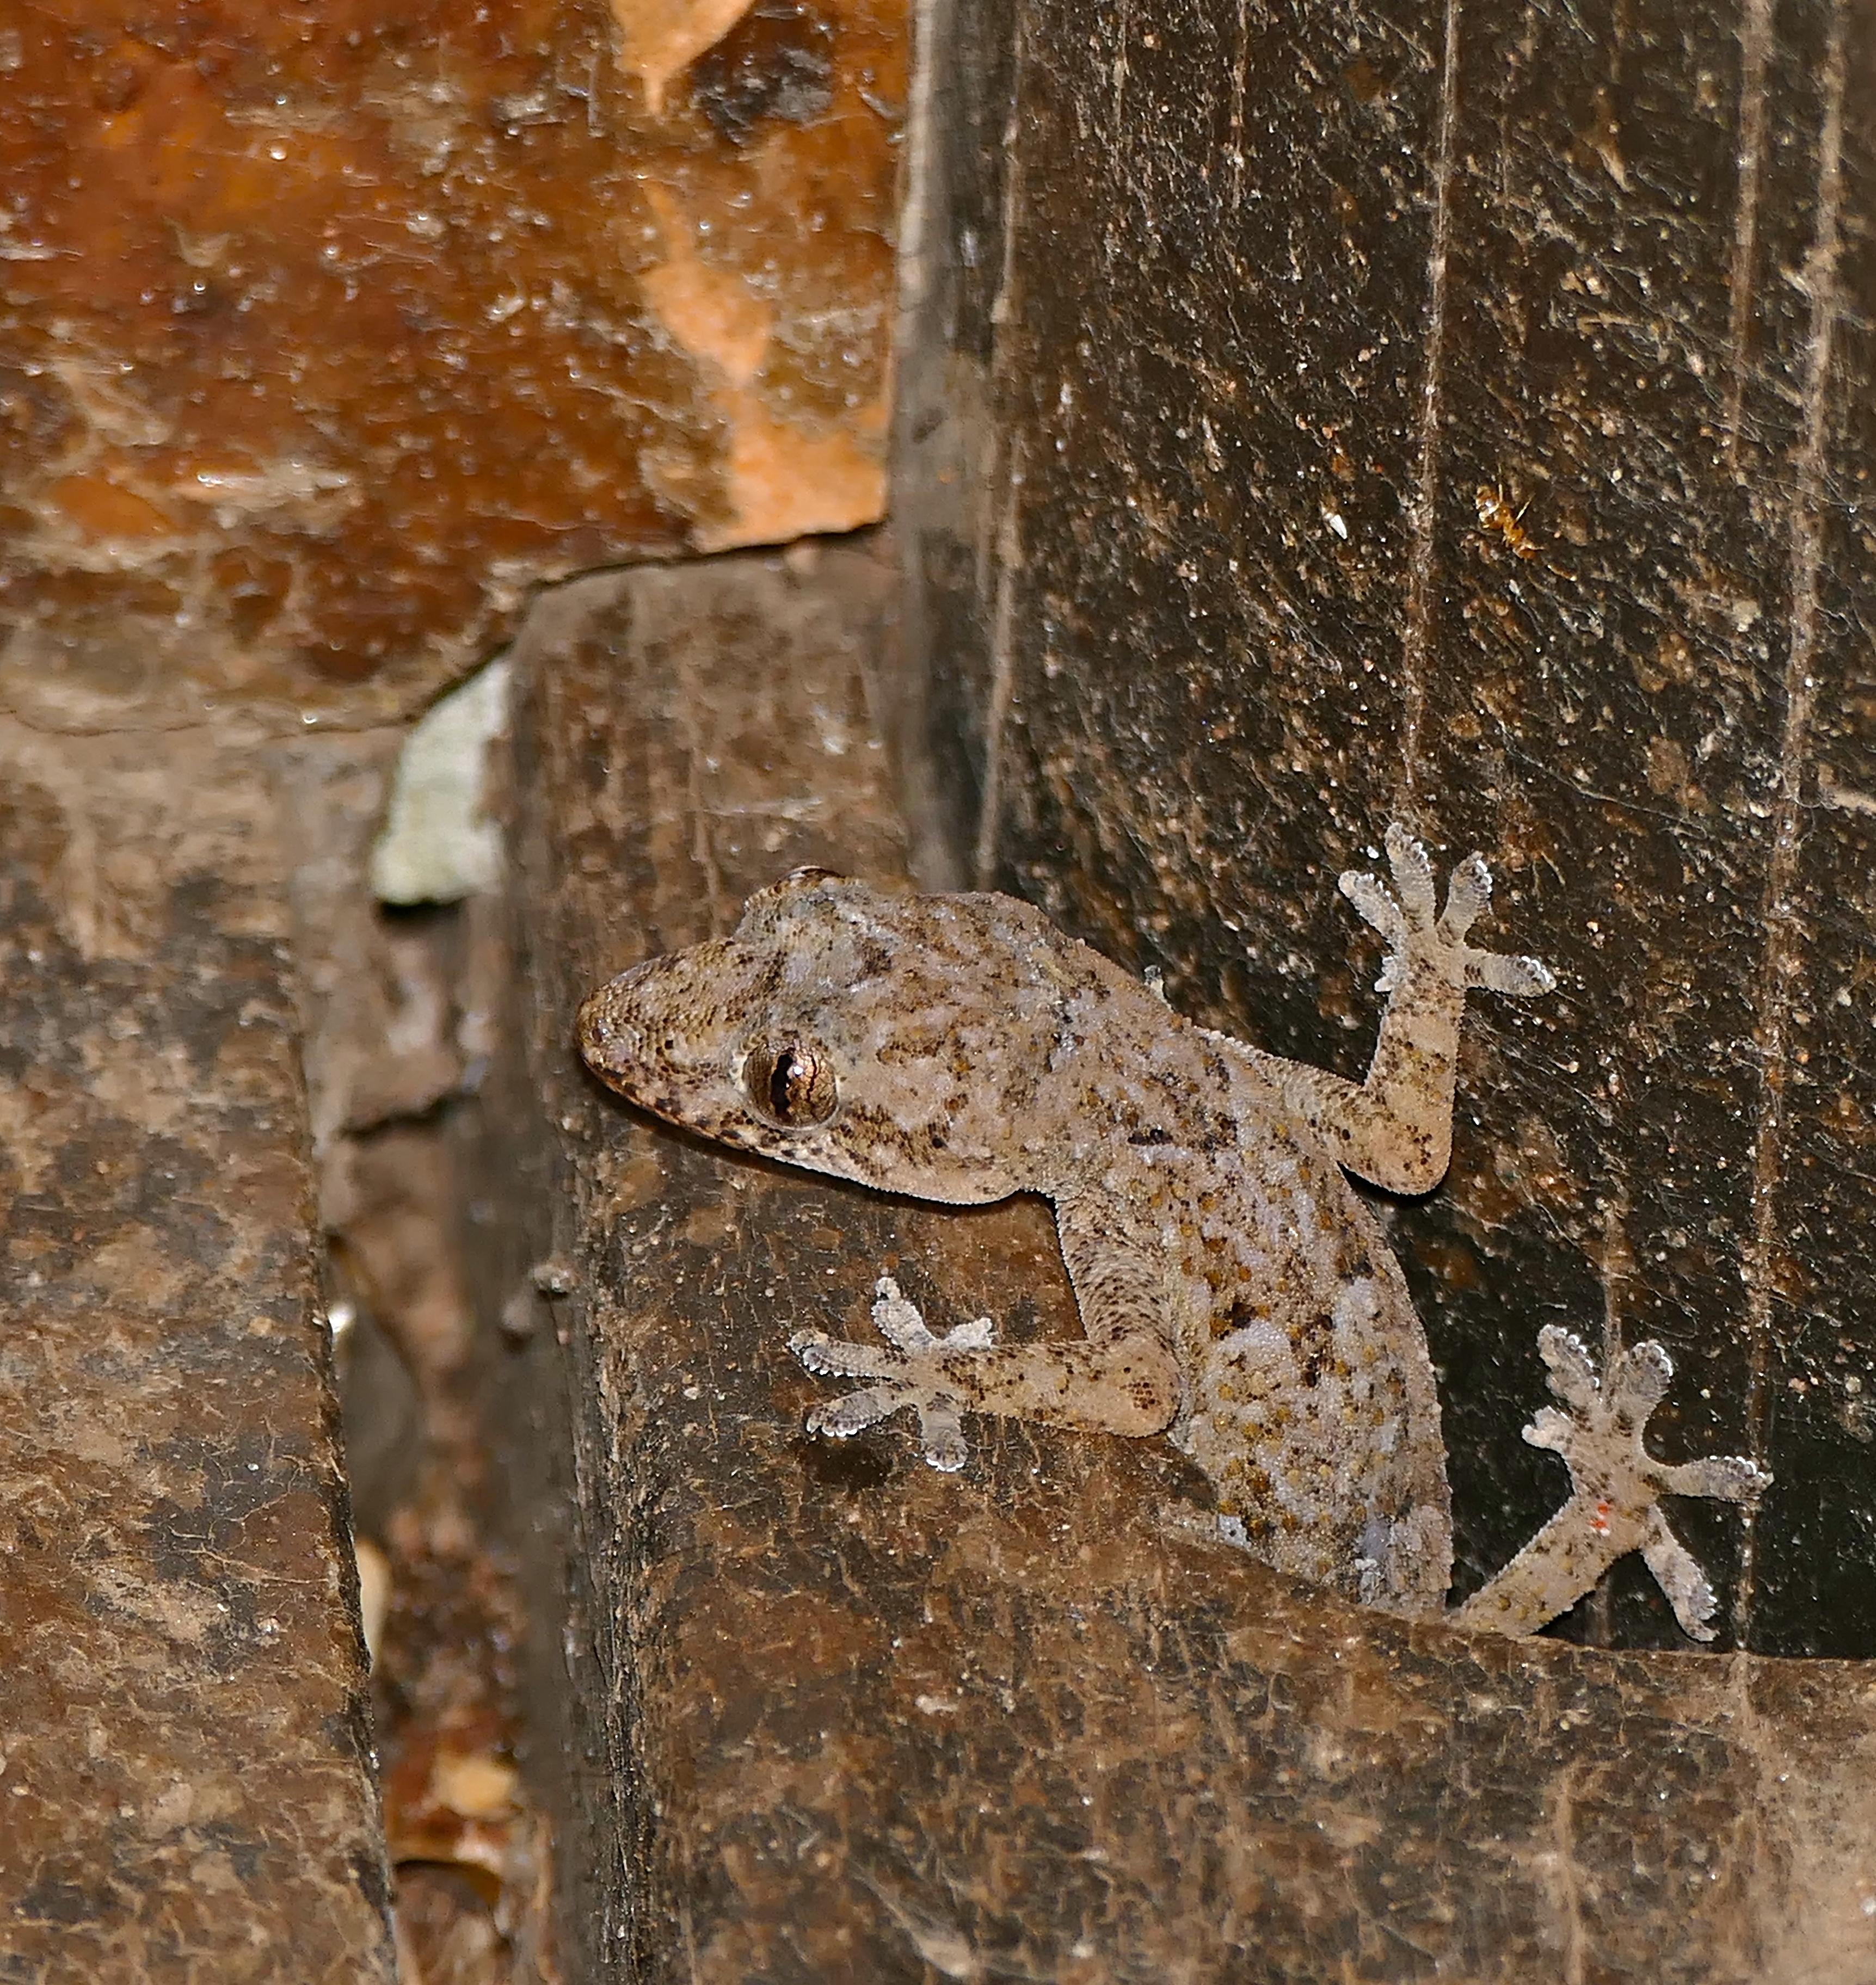 file:tropical house gecko (hemidactylus mabouia) (32152781296)